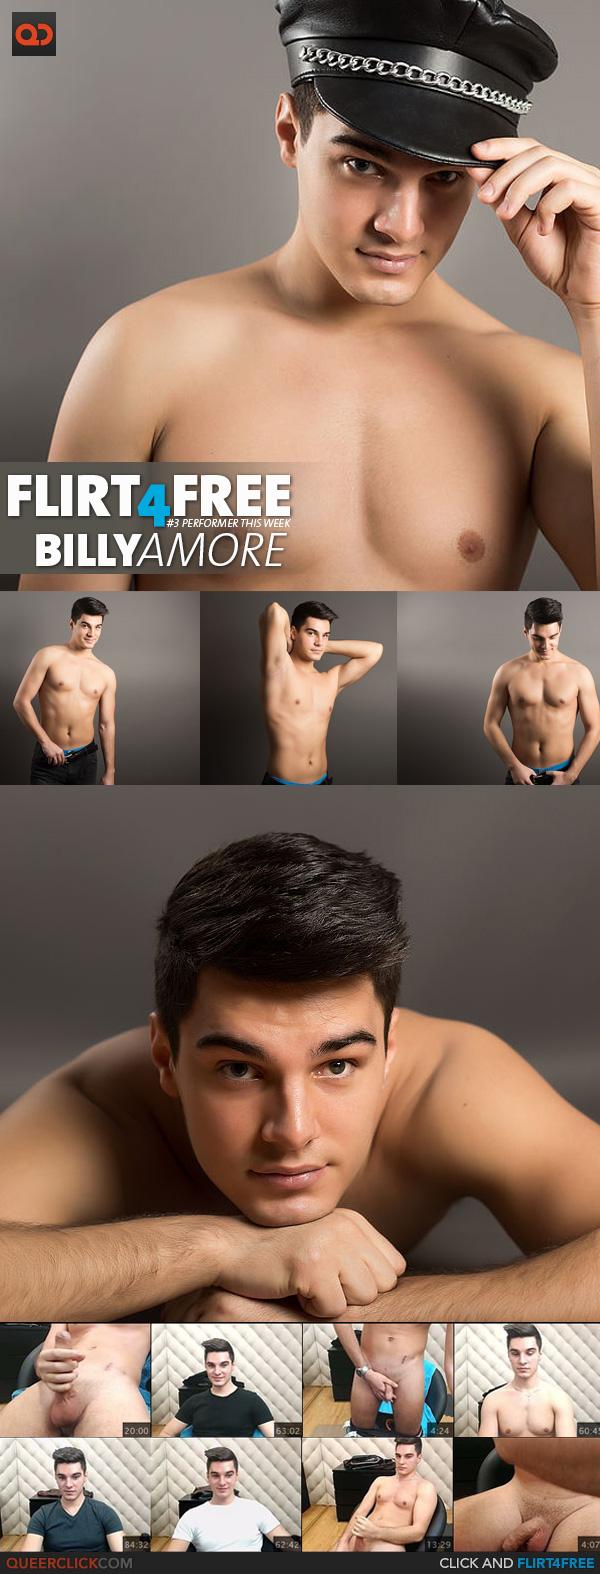 flirt4free billy amore